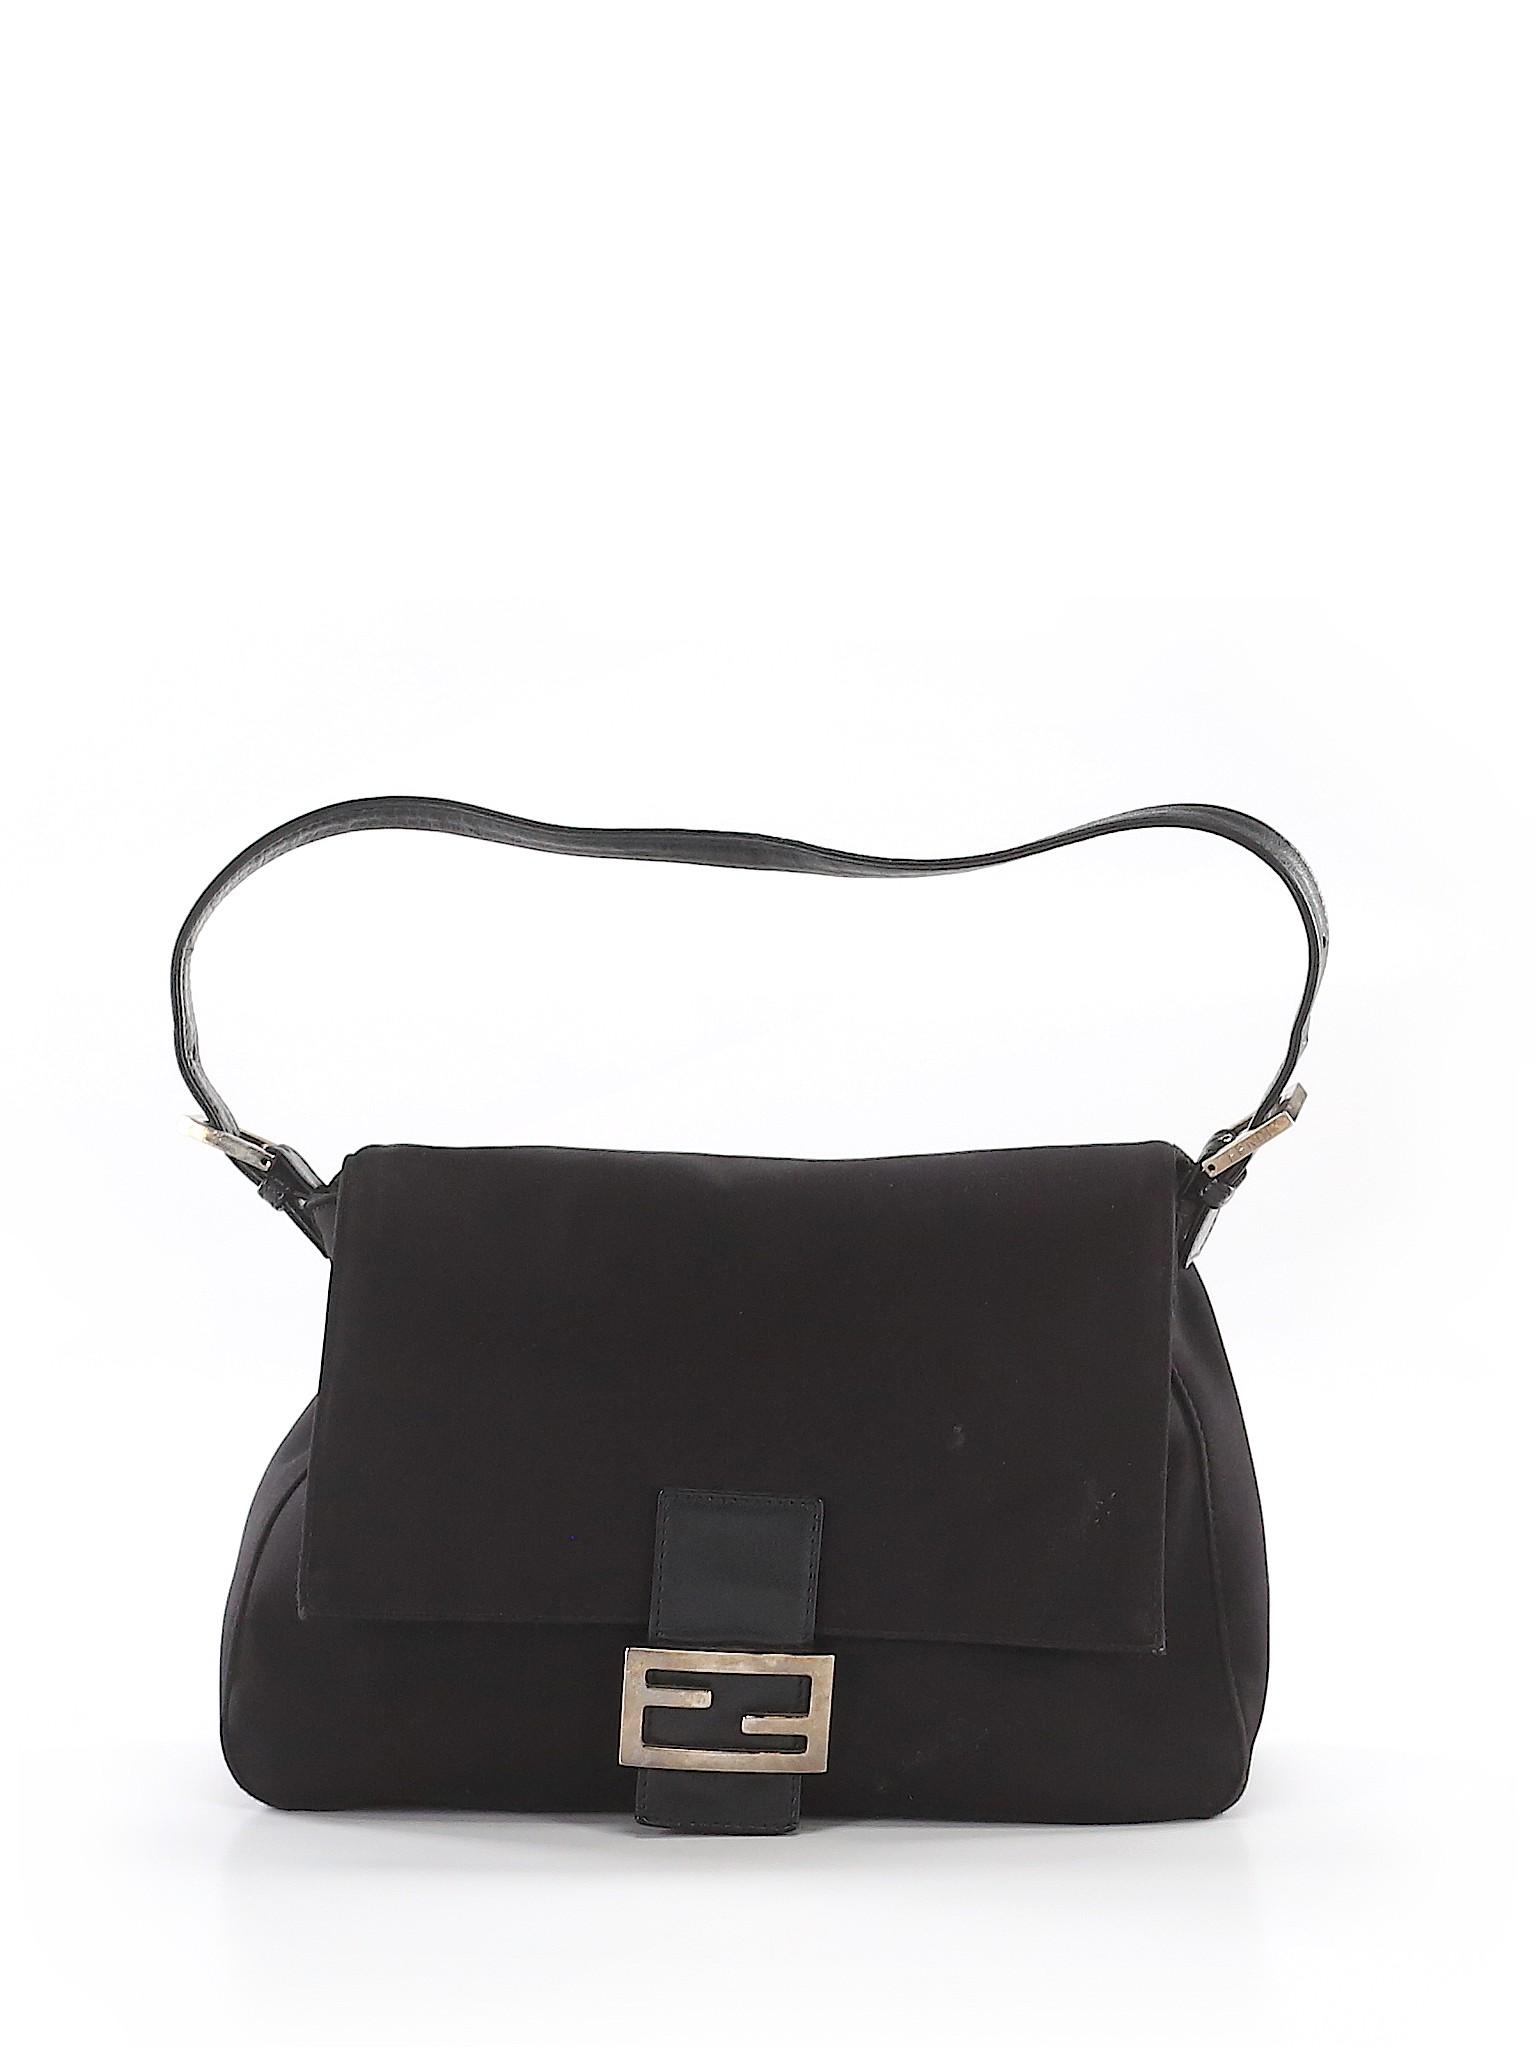 fdd5c840 Details about Fendi Women Black Shoulder Bag Fits All Women